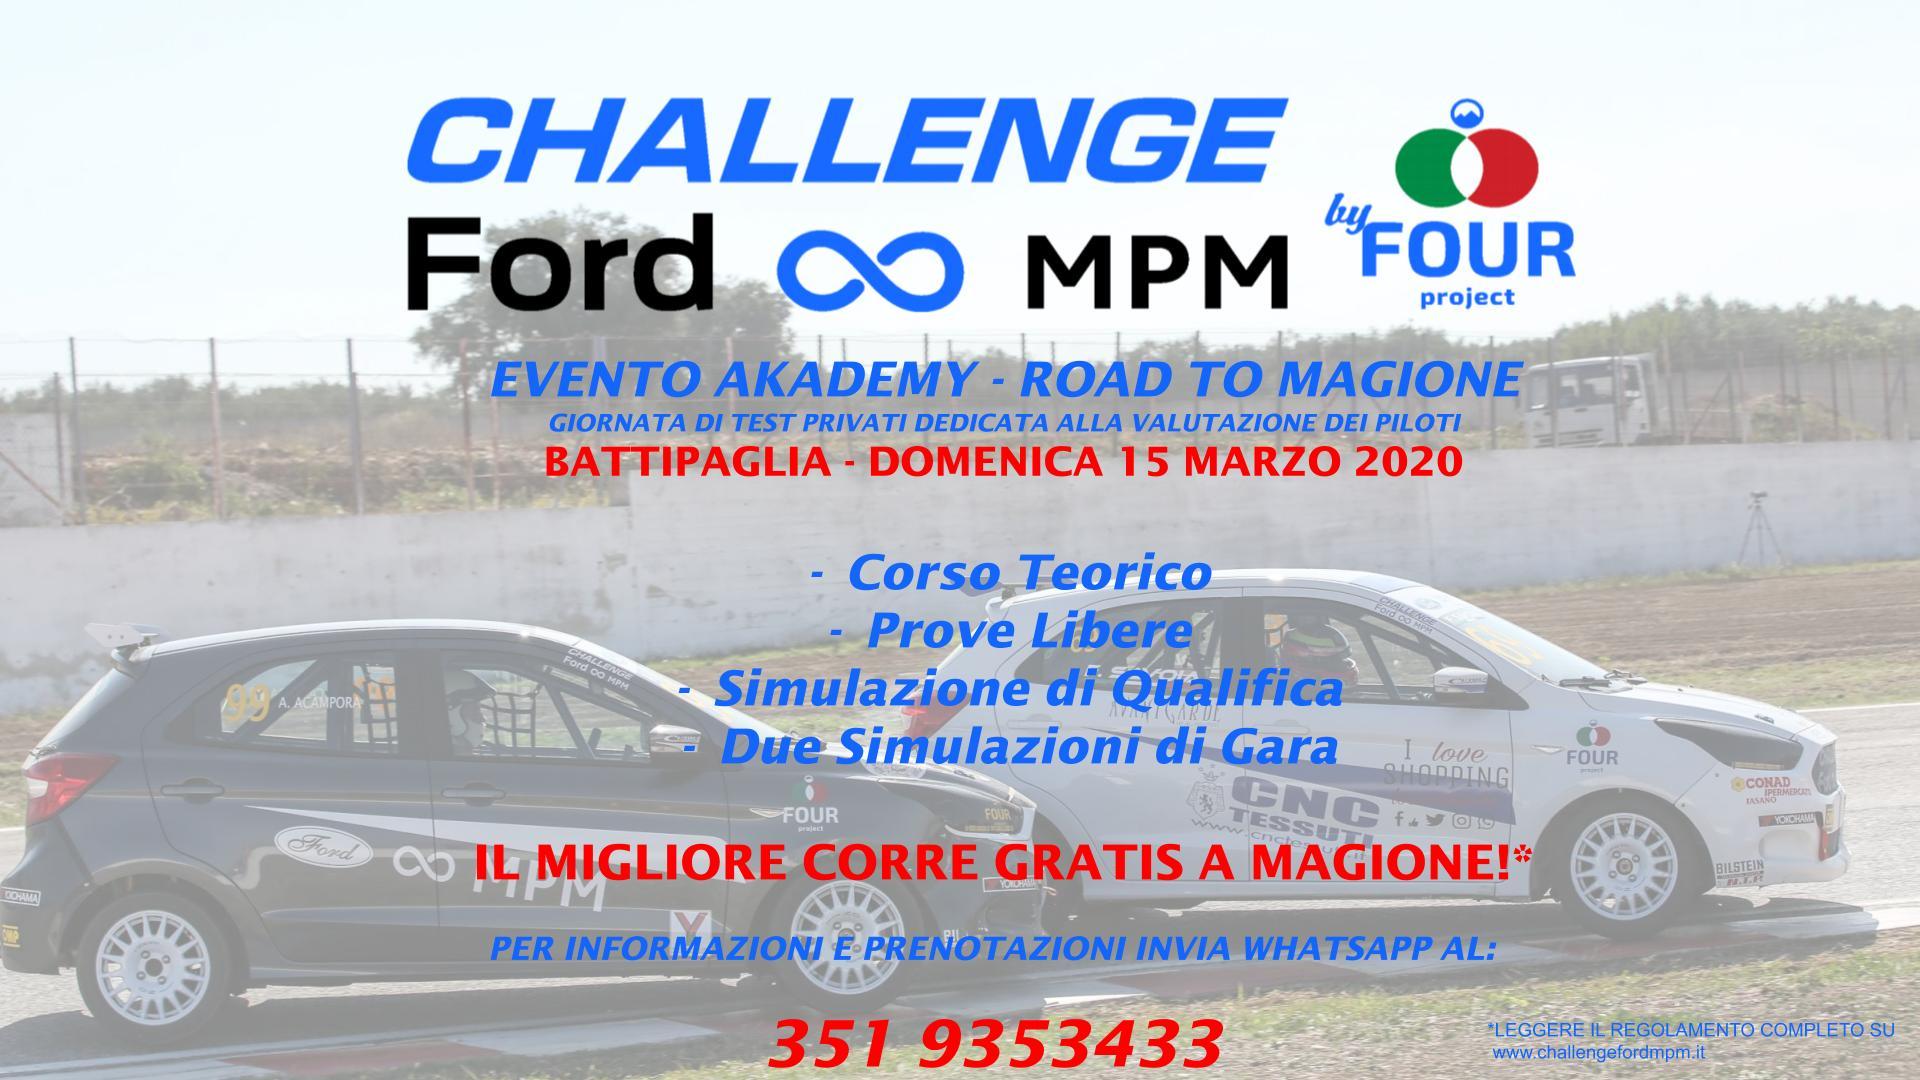 Evento Akademy – Road to Magione